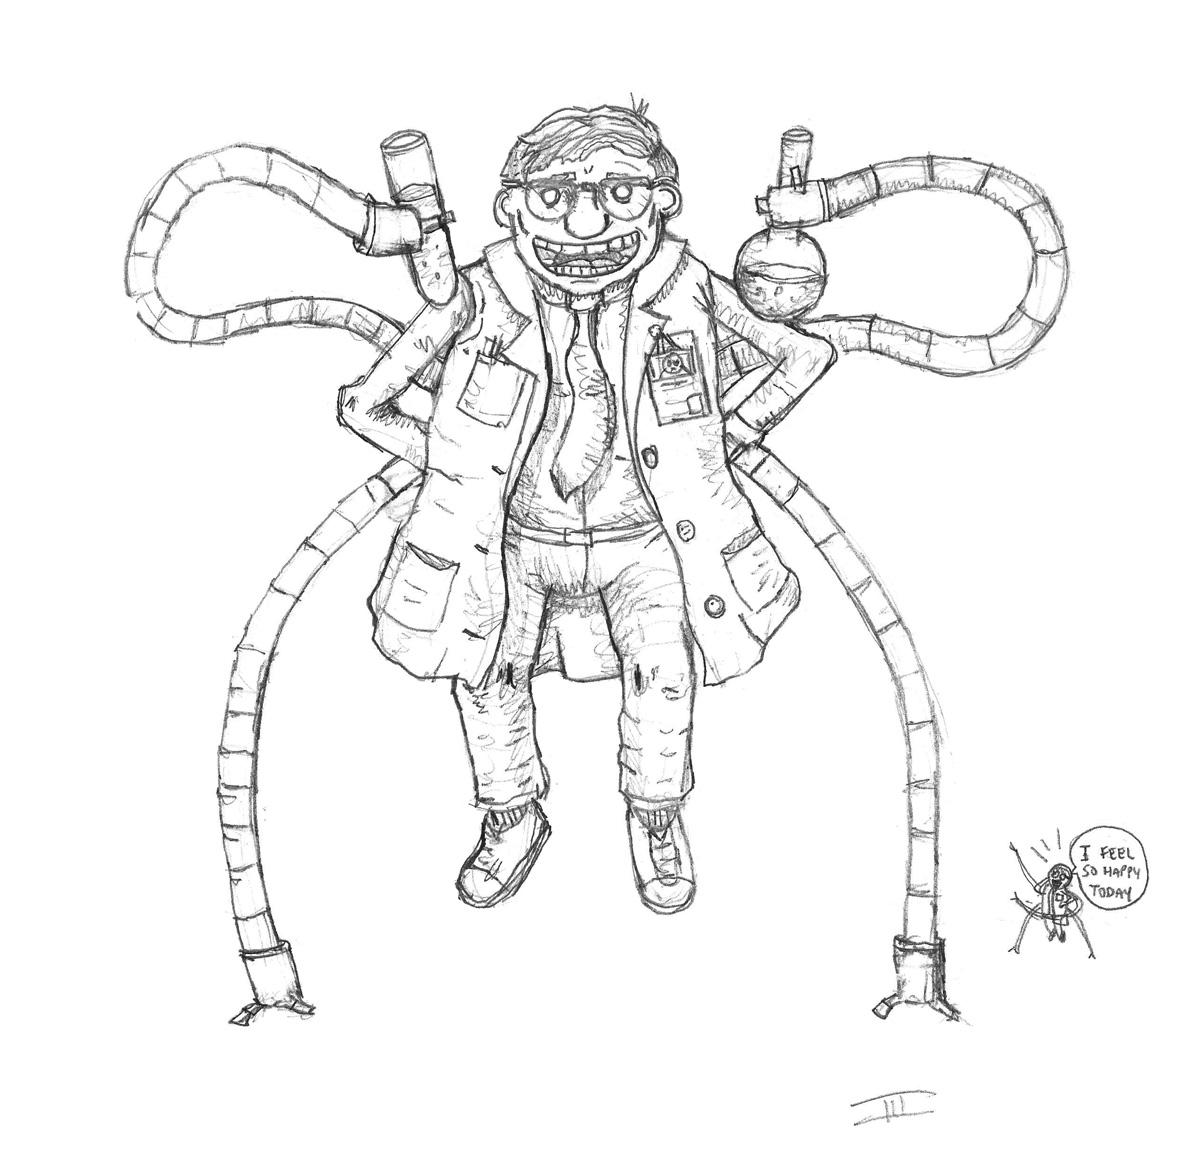 A Happy, Not Bad, Dr. Octopus by Gargantuan-Media